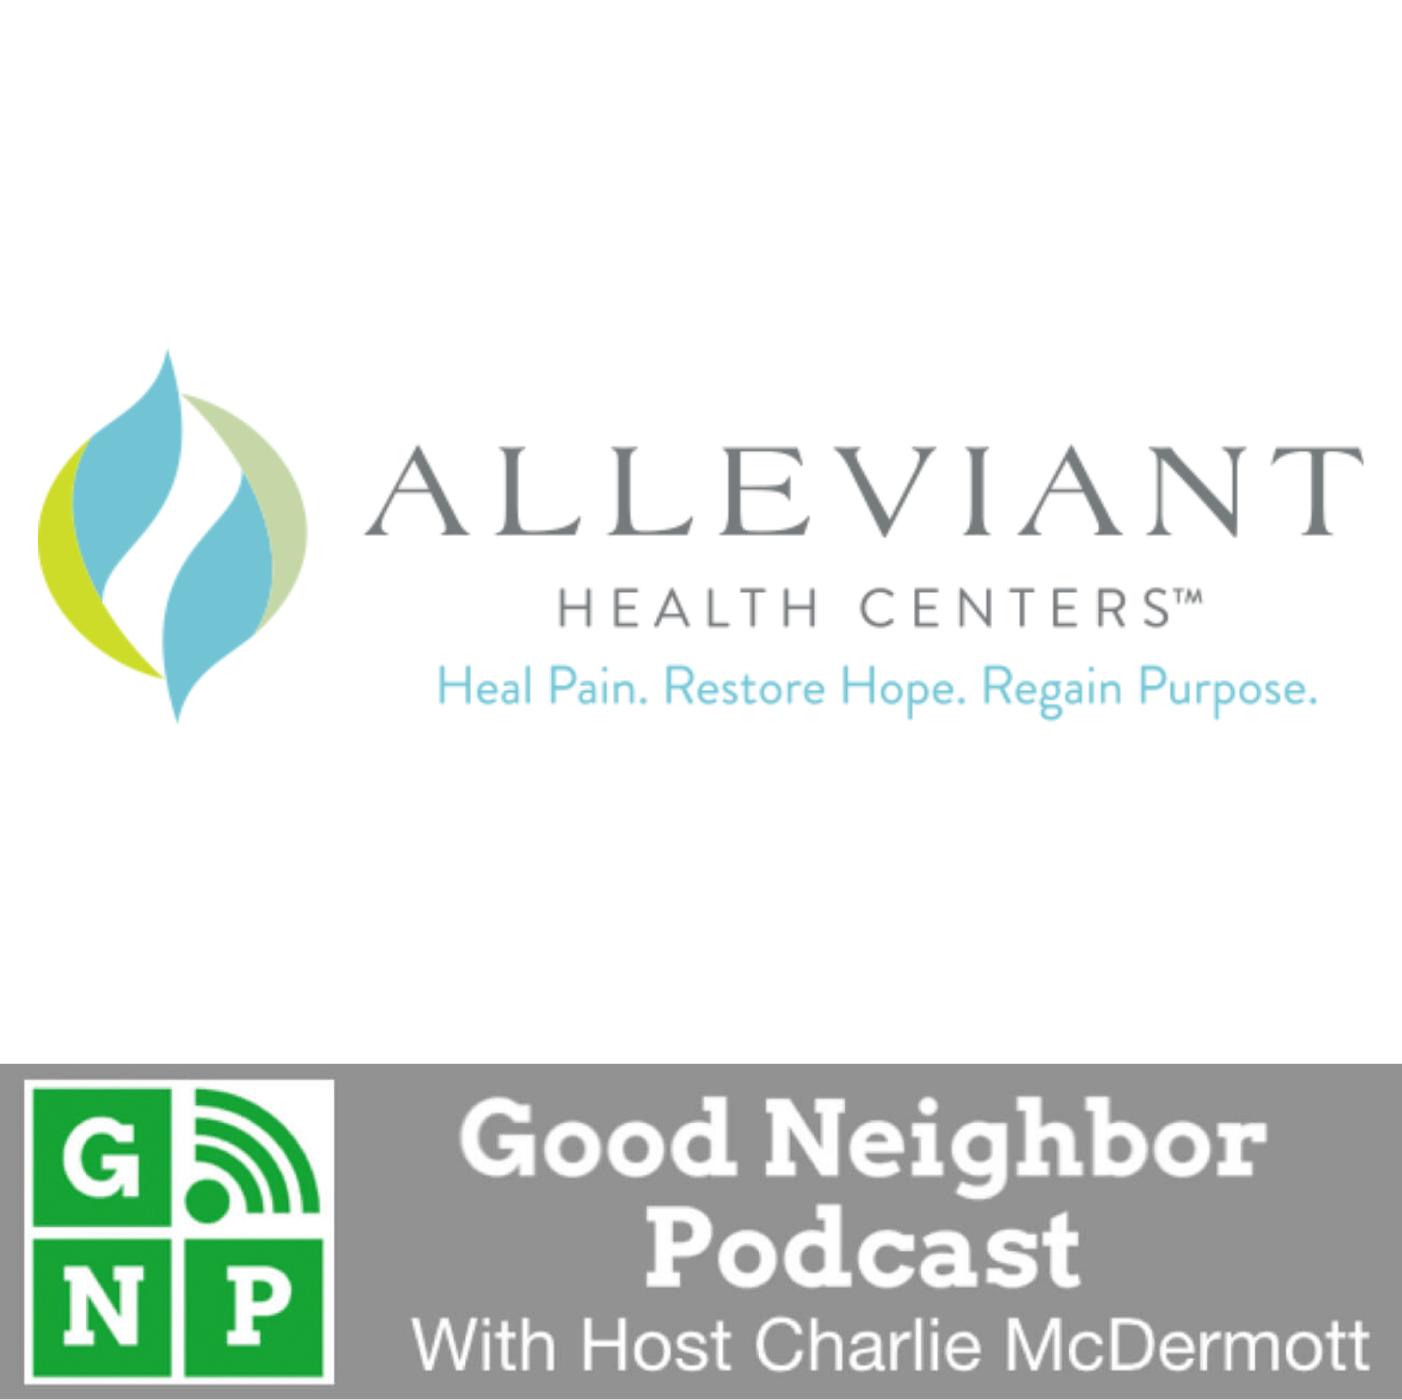 GNP - Alleviant Health Centers - BADGE